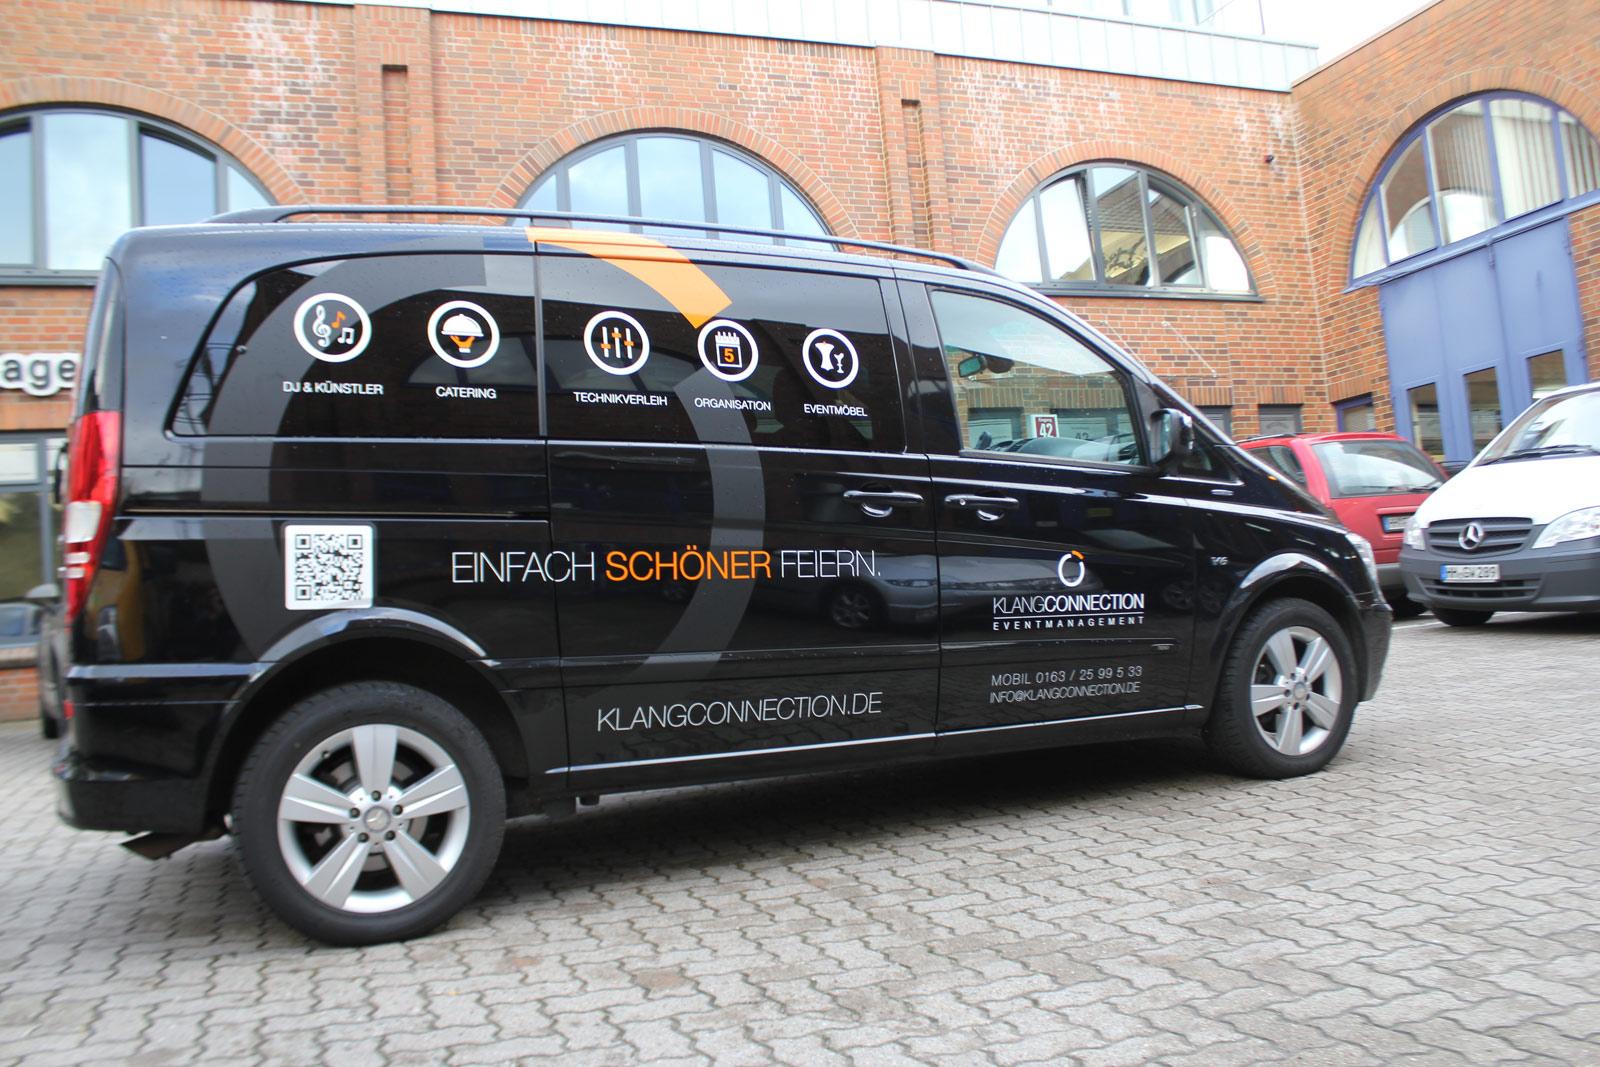 KlangConnection Werbebeklebung auf dem Mercedes Viano.